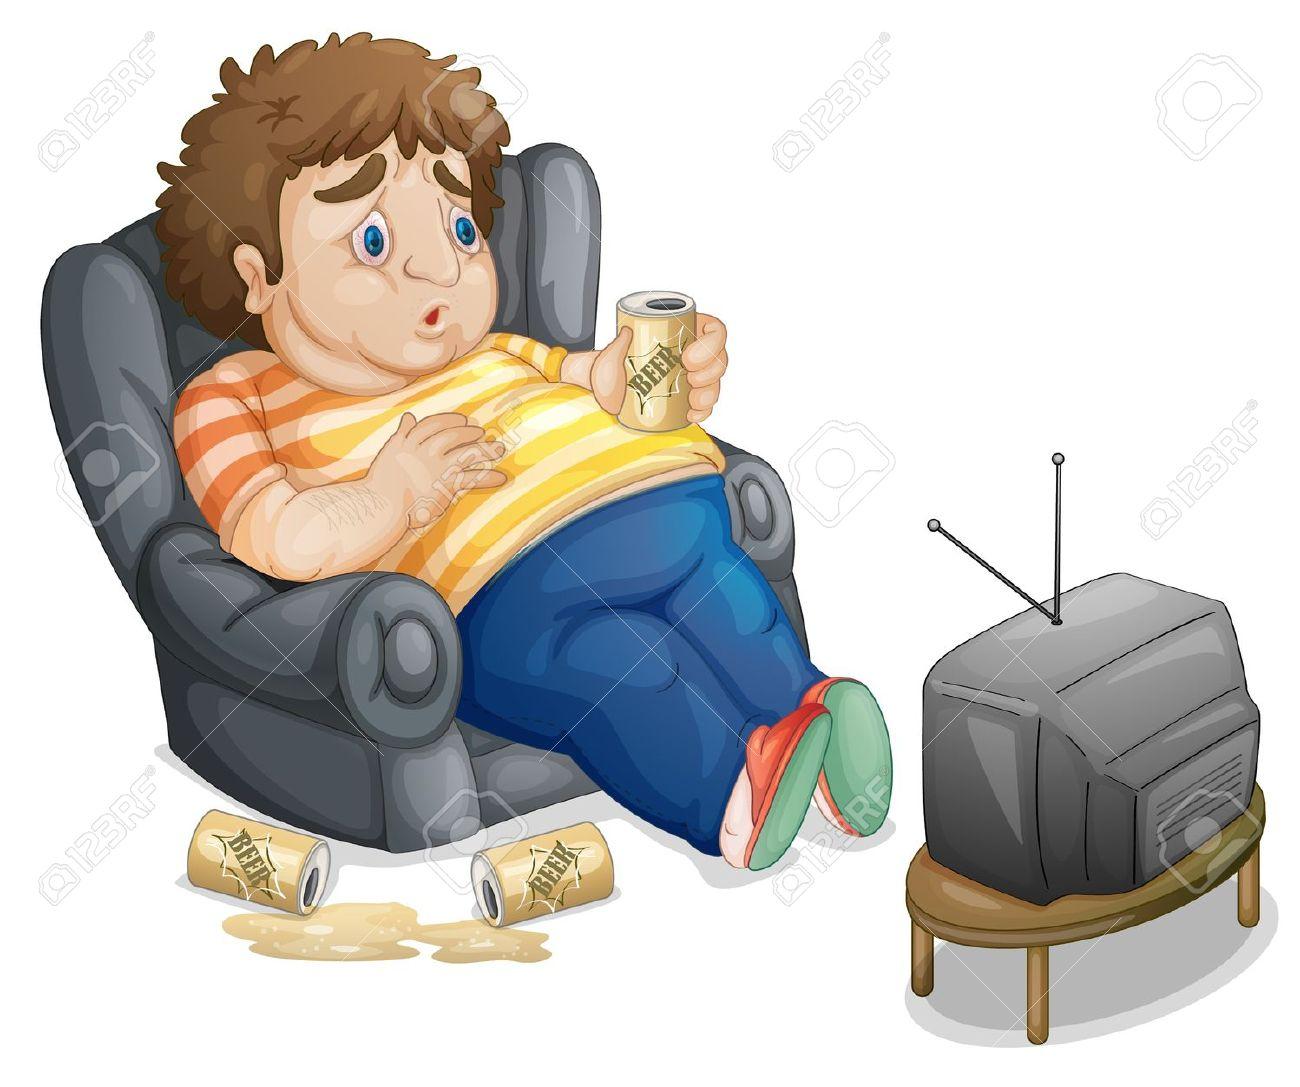 Obese Couch Potato Inactive clipart - Cli...